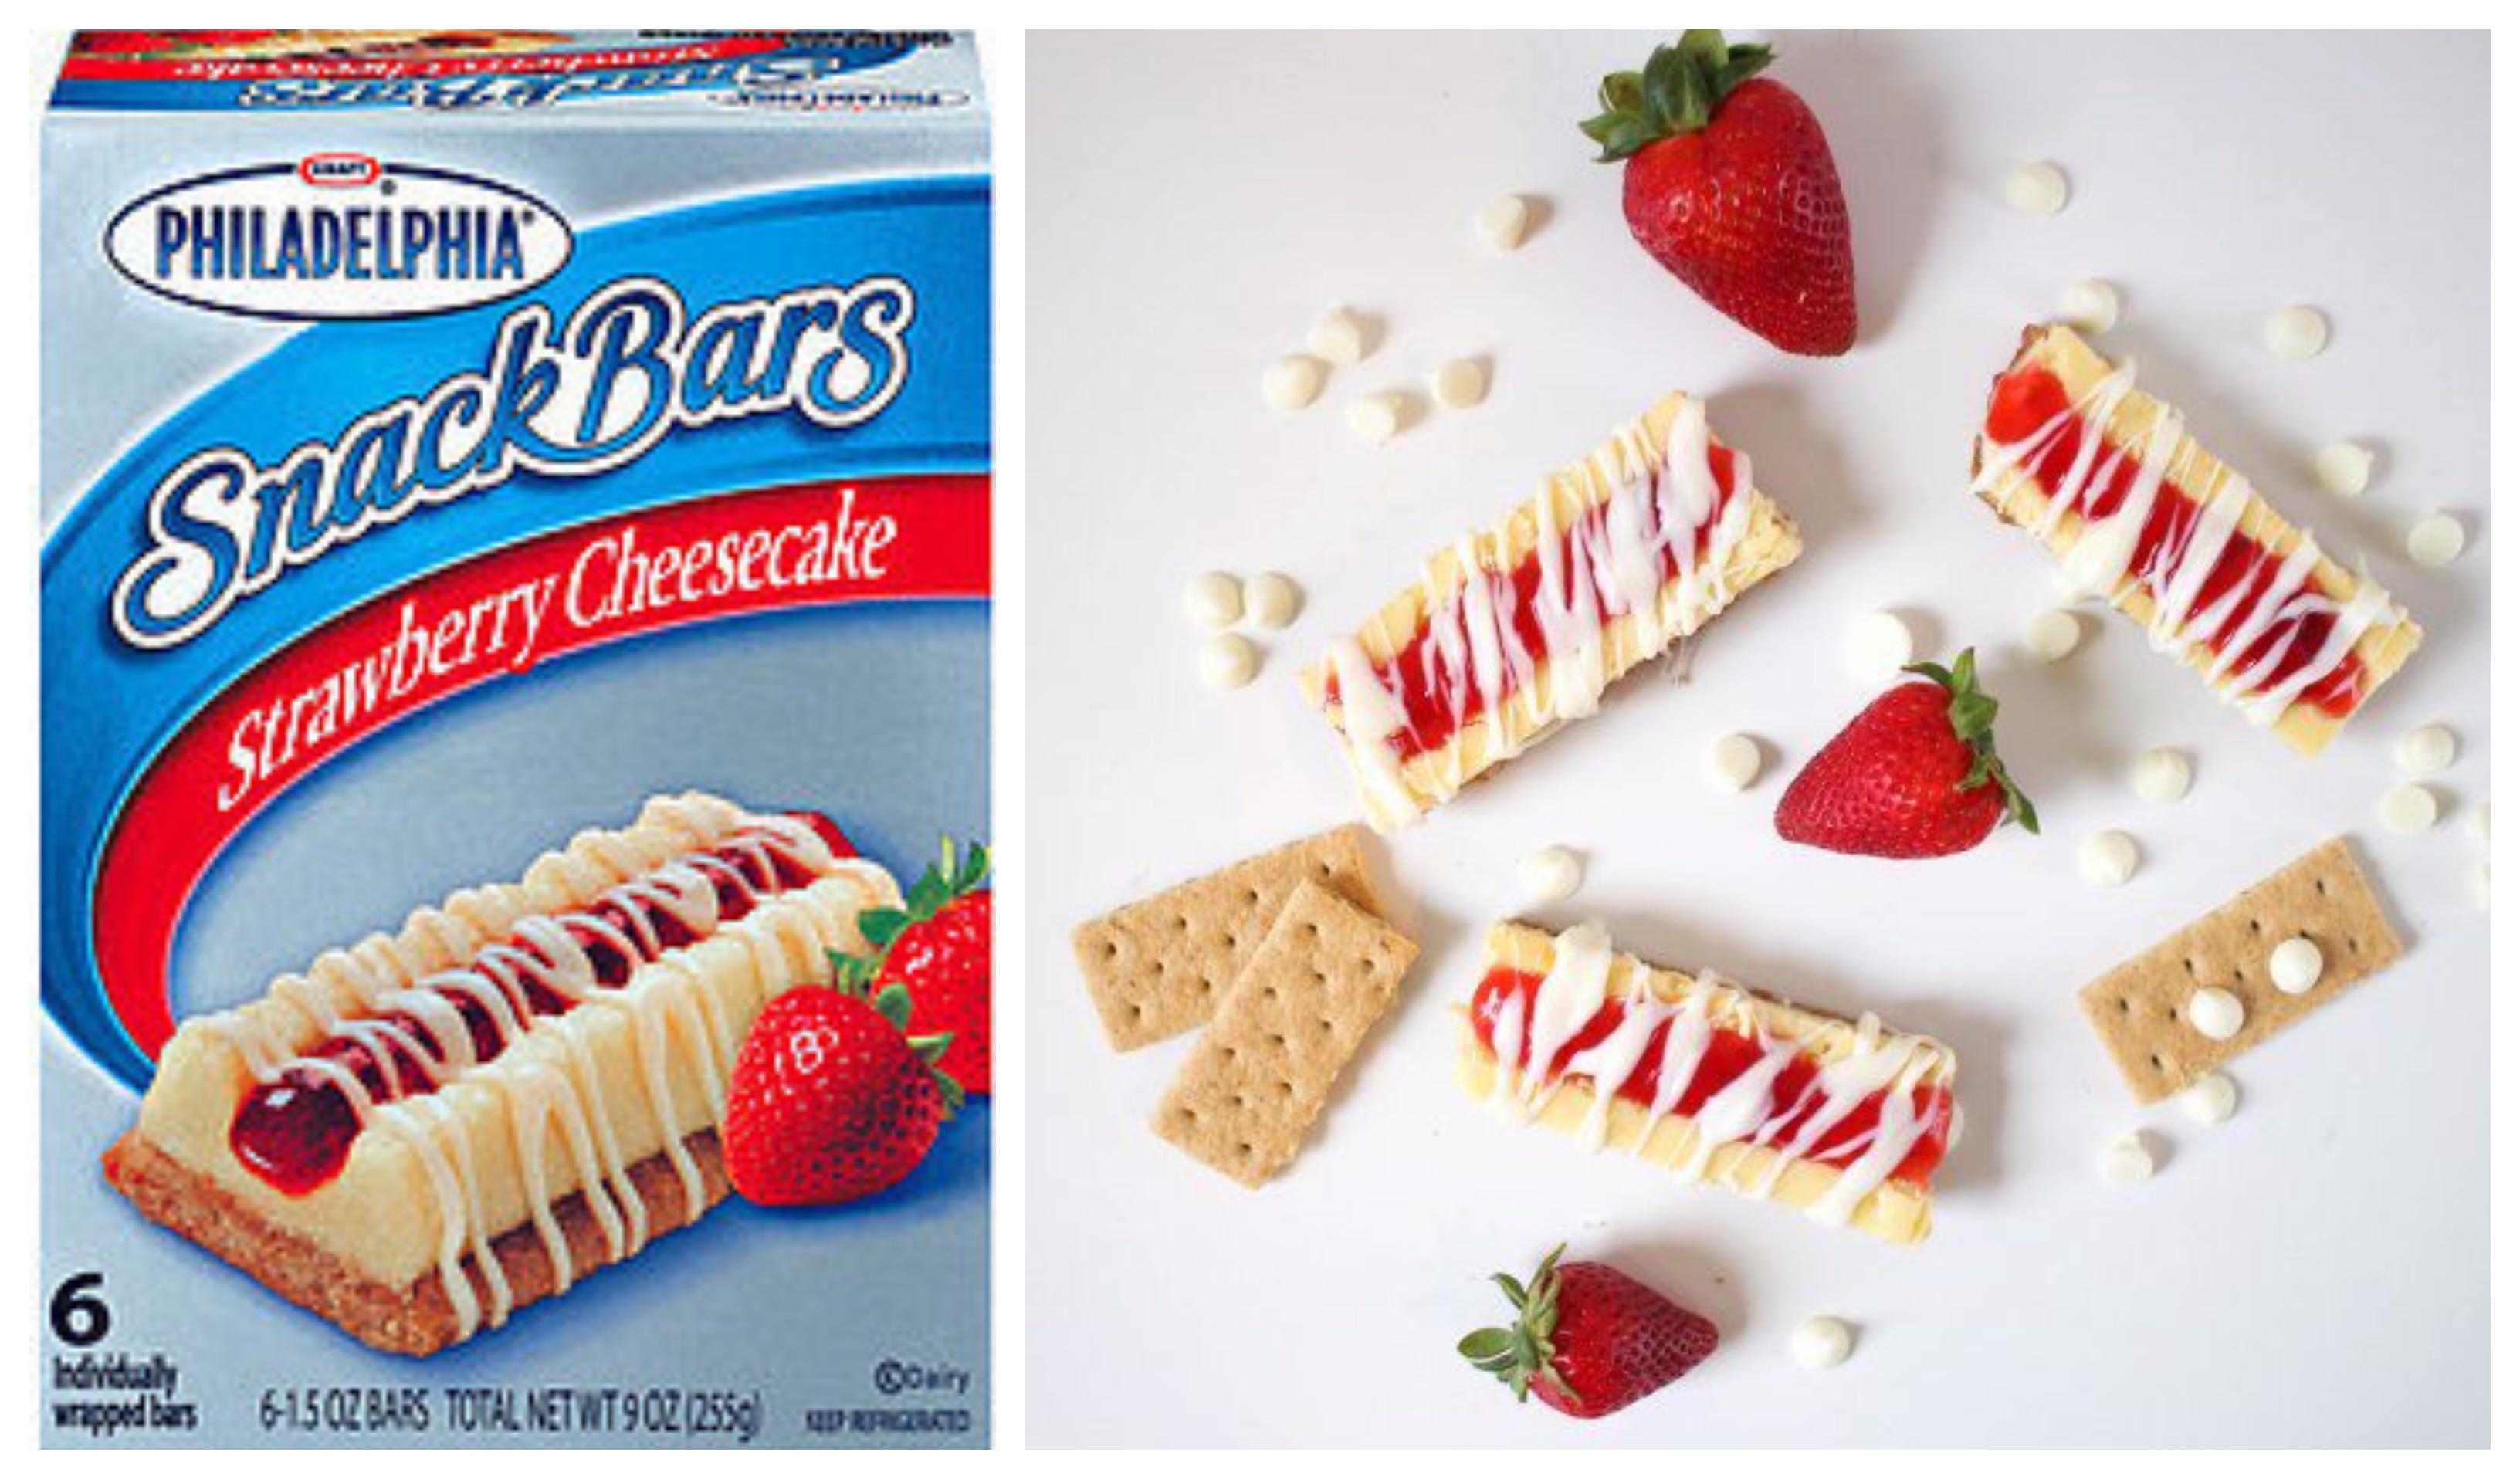 Philadelphia Cream Cheese Strawberry Cheesecake Snack bars-collage